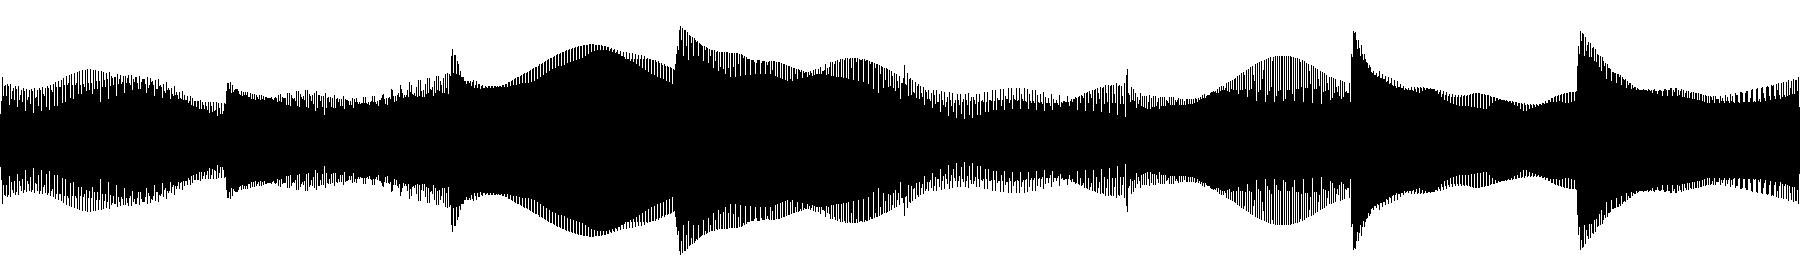 vedh melodyloop 097 fm7 g d c 124 bpm